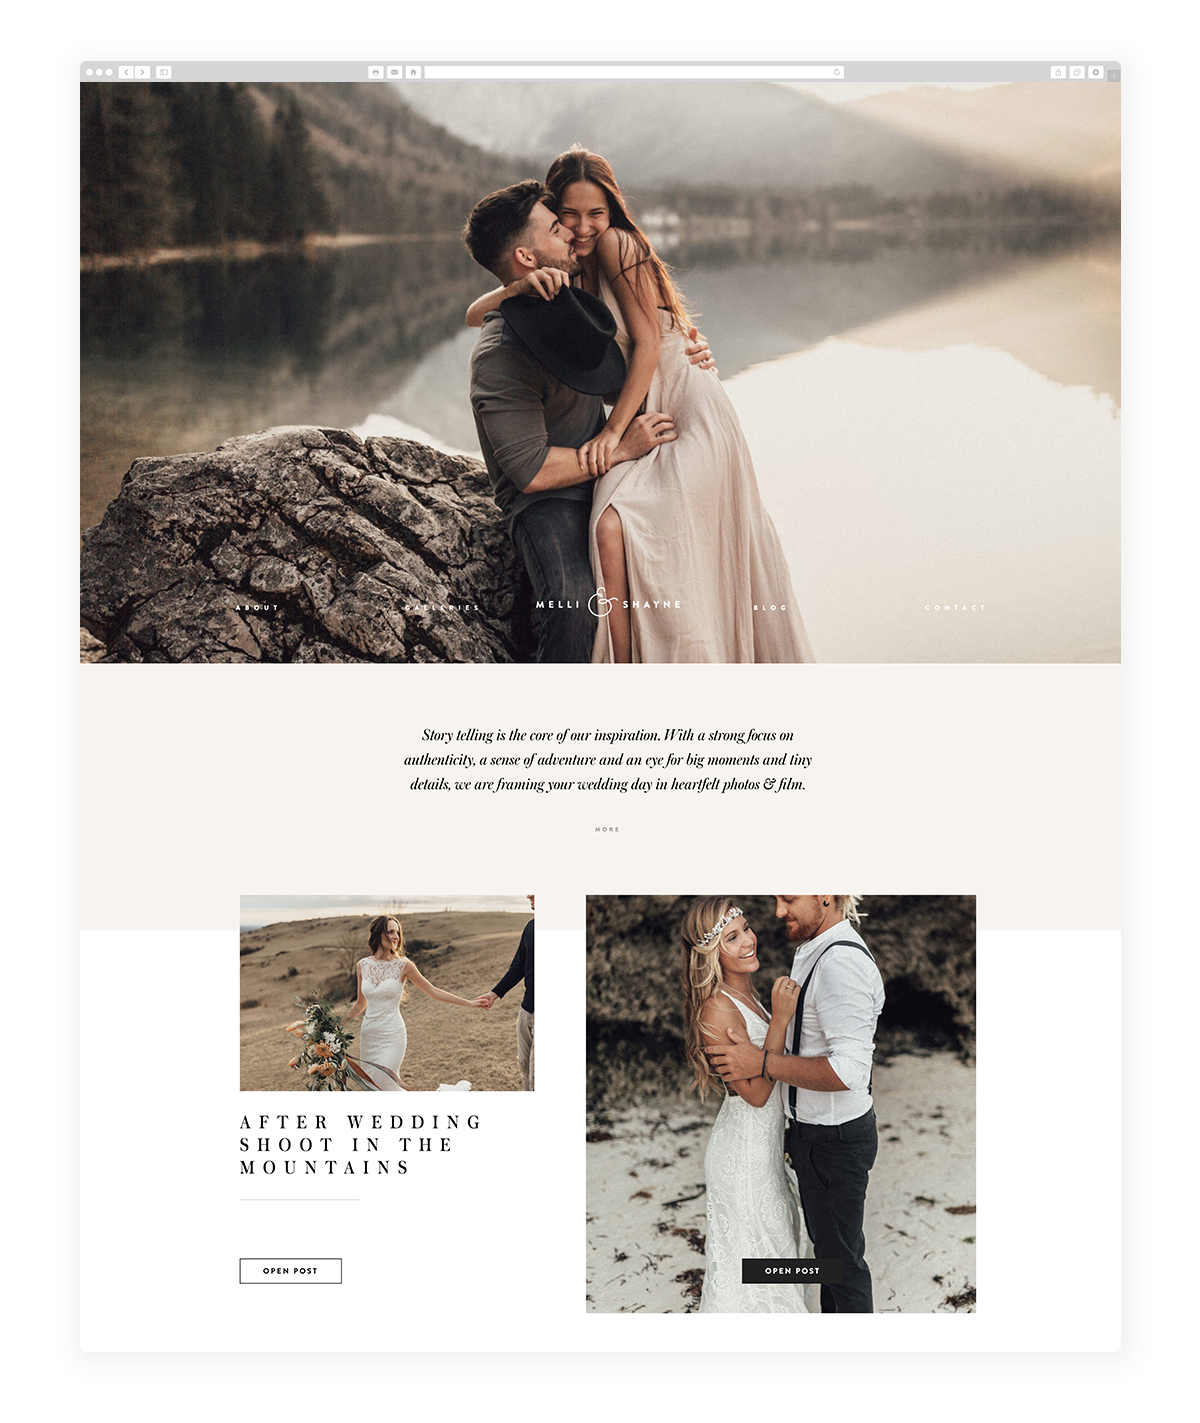 Melli&Shayne, German Photographers using Flothemes for their website